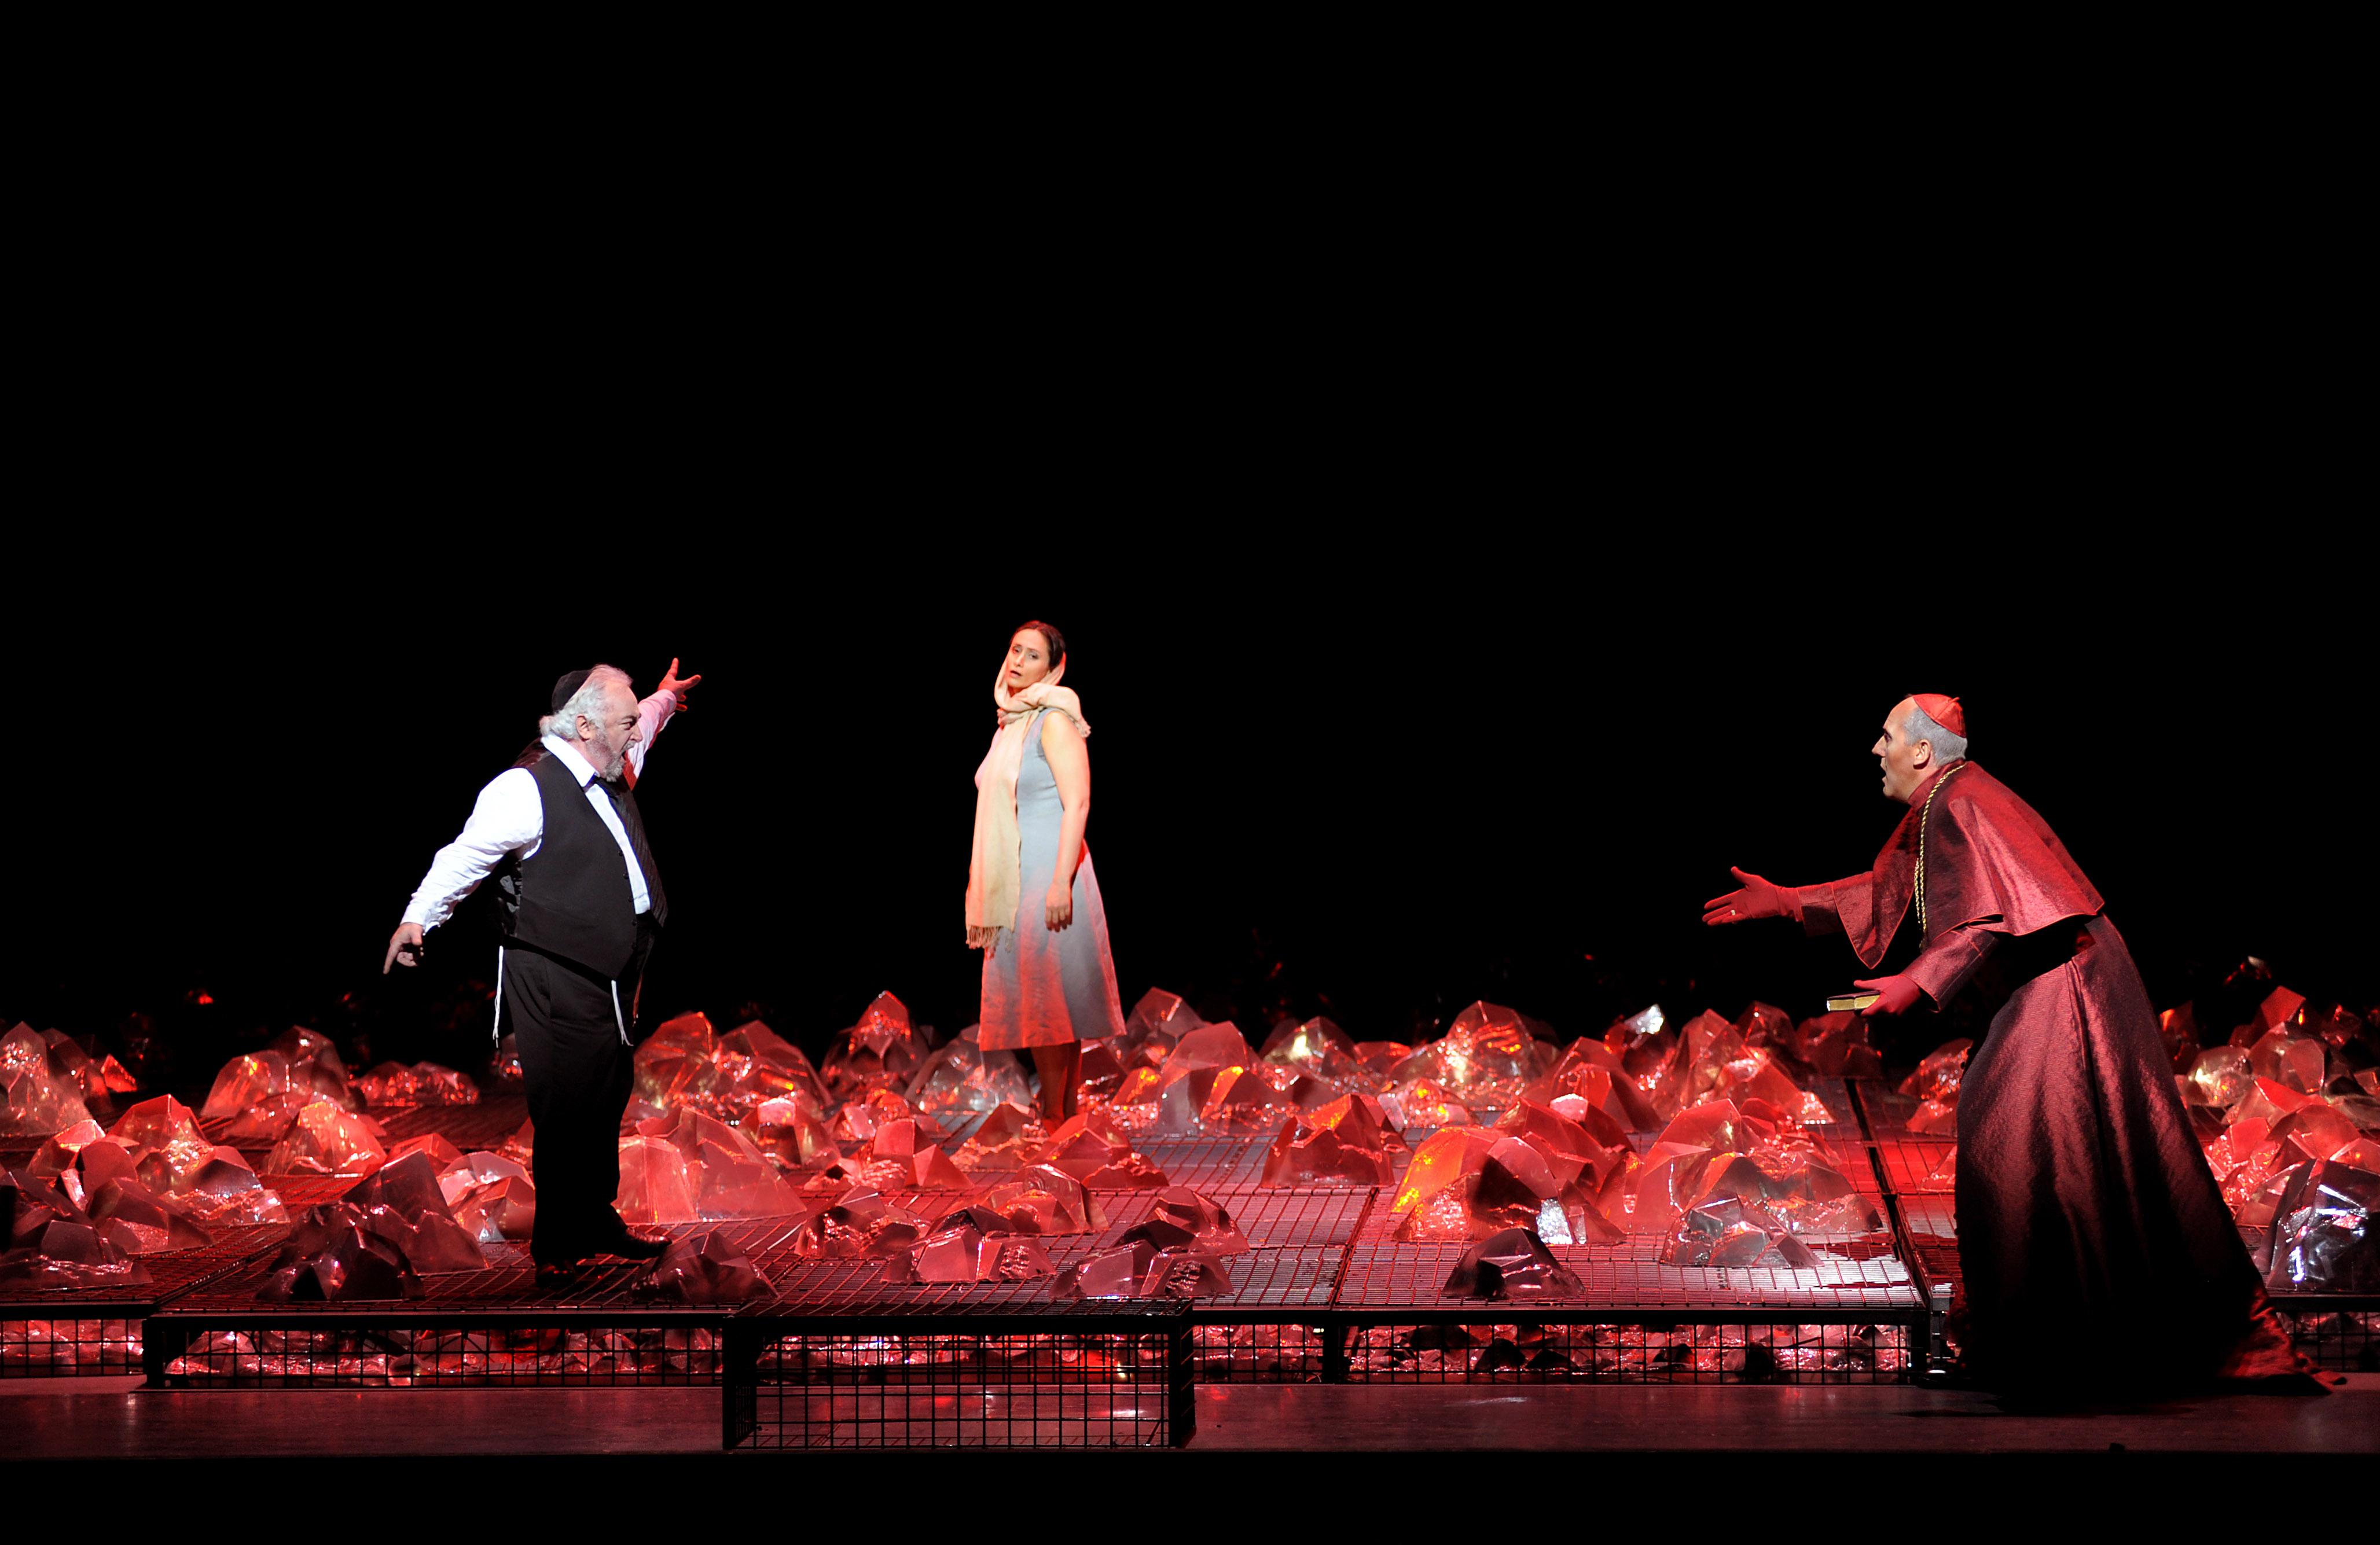 Carlo Rizzi (conductor), Pierre Audi (director), George Tsypin (sets), Dagmar Niefind (costumes), Jean Kalman (lighting design), Amir Hosseinpour (choreography), Willem Bruls (dramaturge)